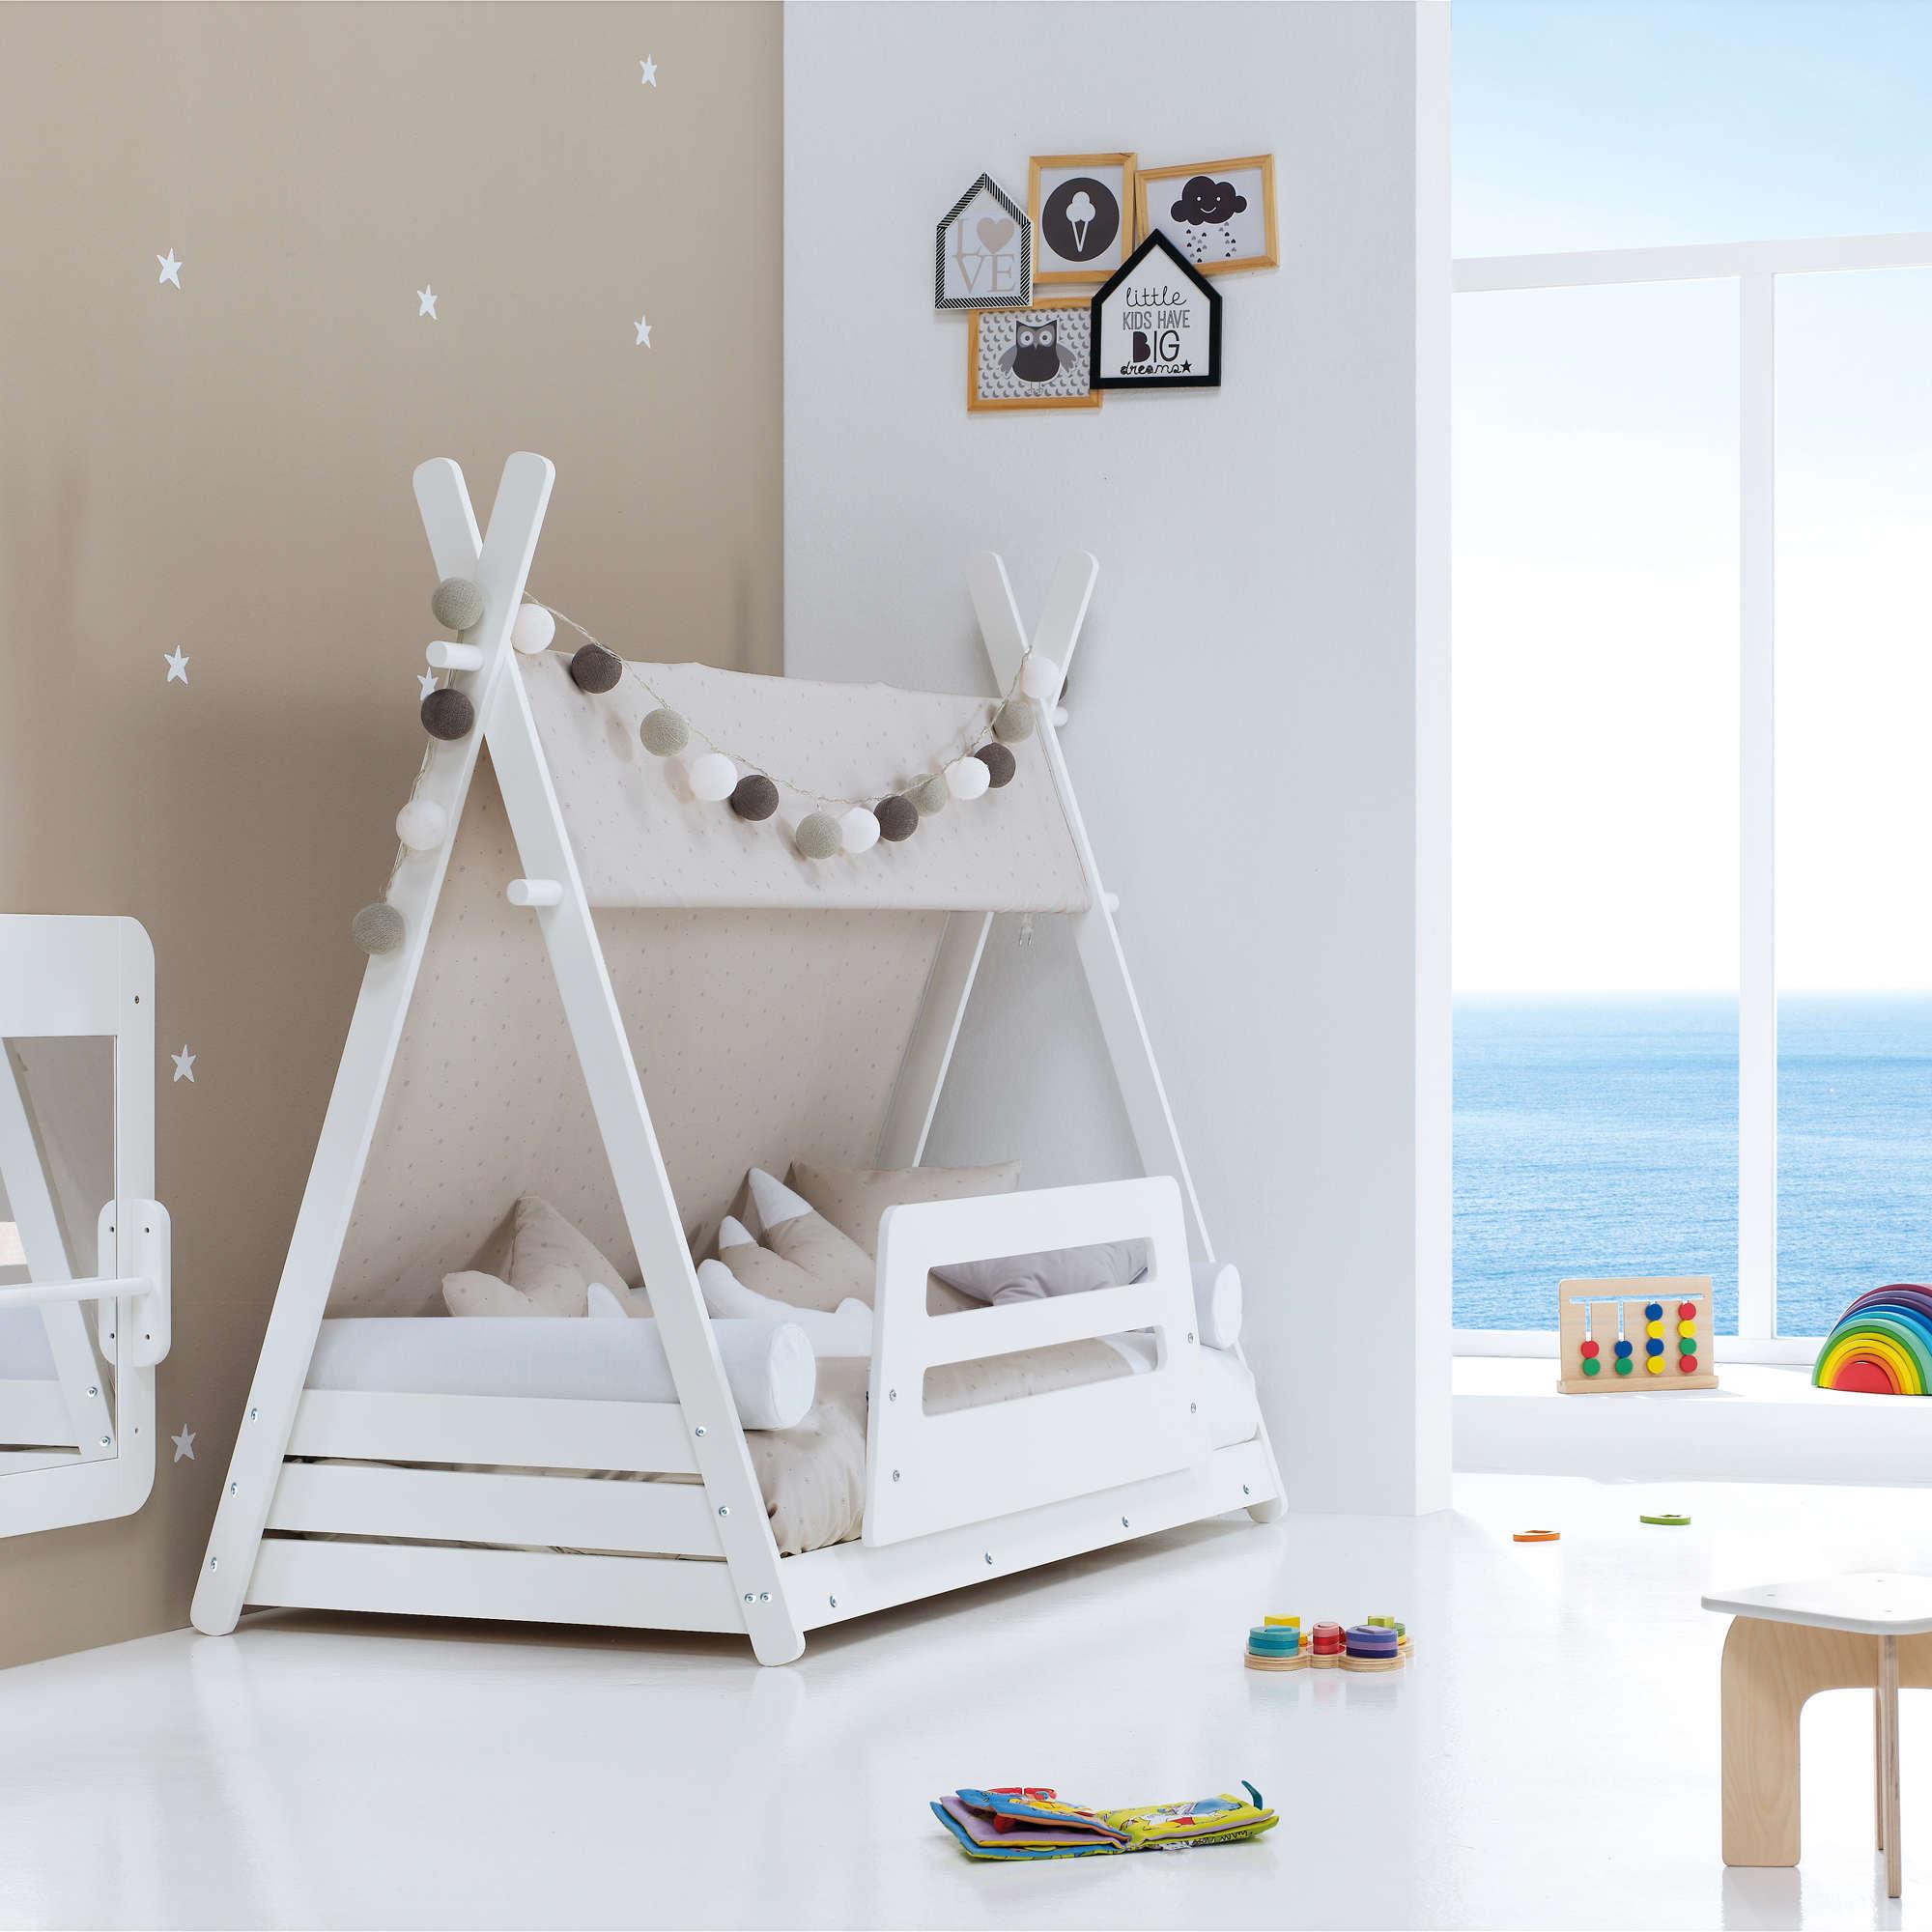 Camas Montessori Homy 70x140cm y Homy XL 90x200cm Alondra